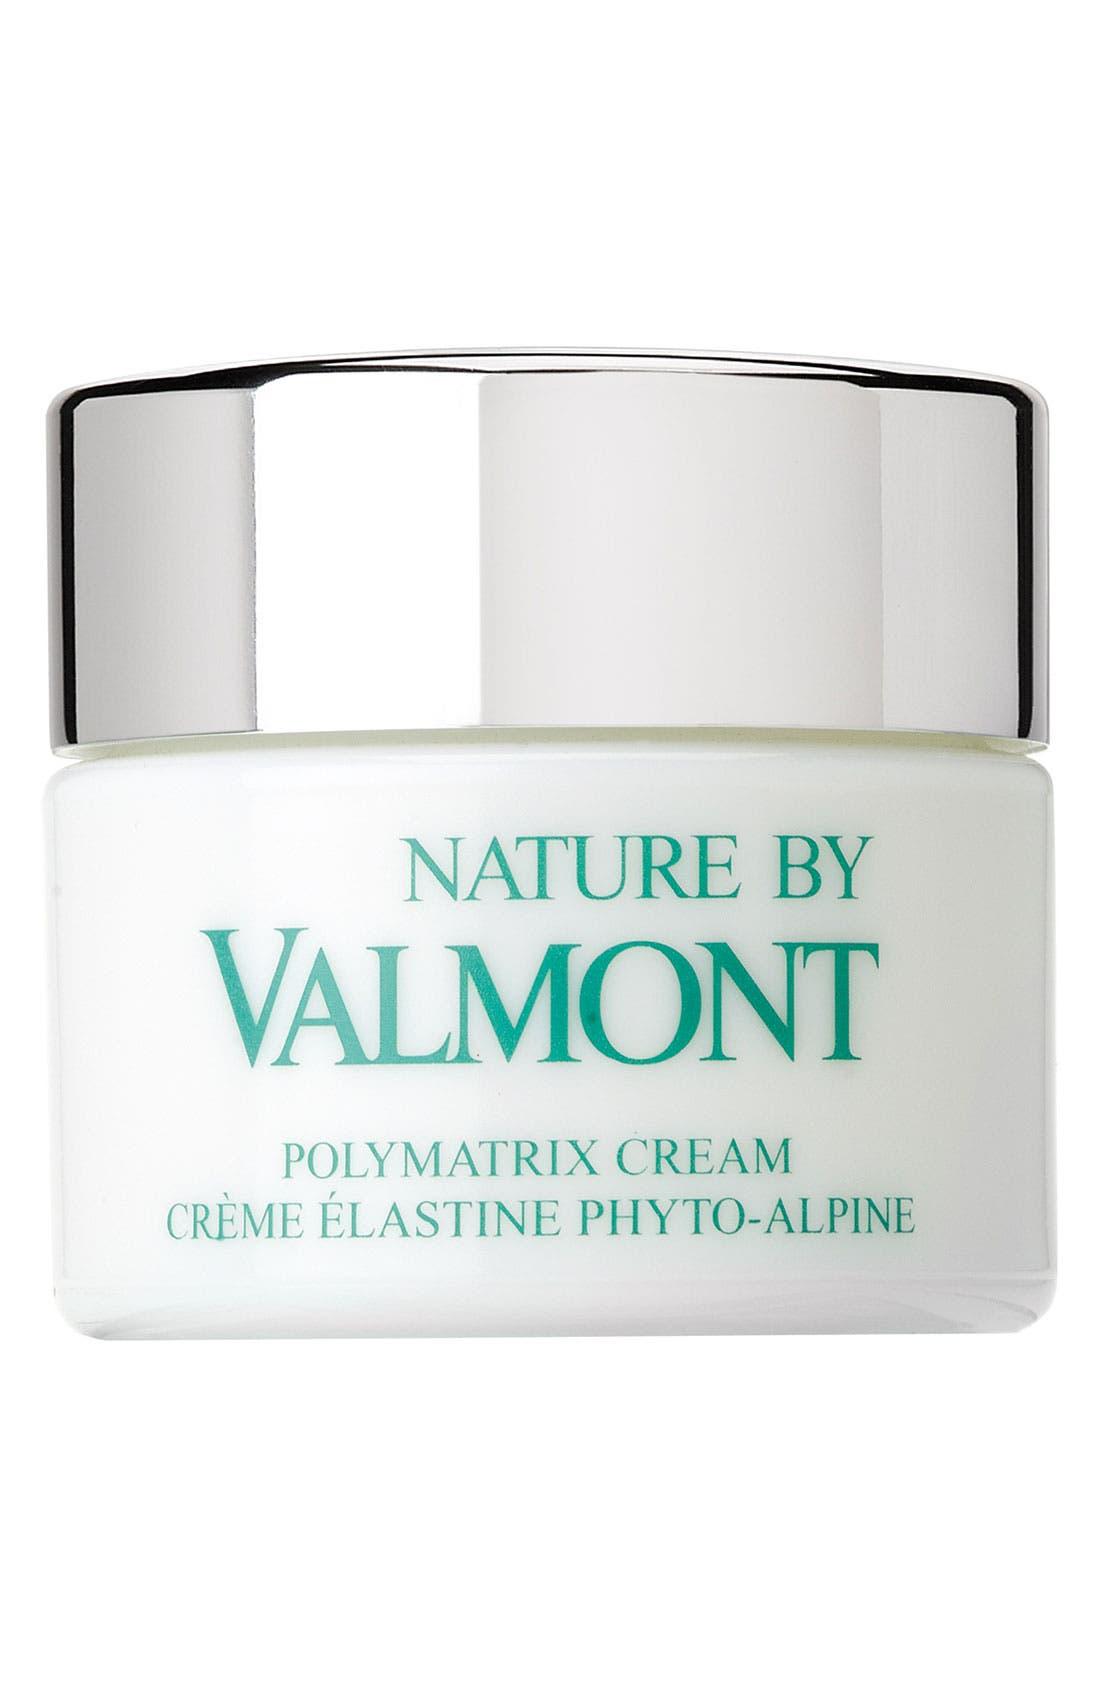 Valmont Polymatrix Cream